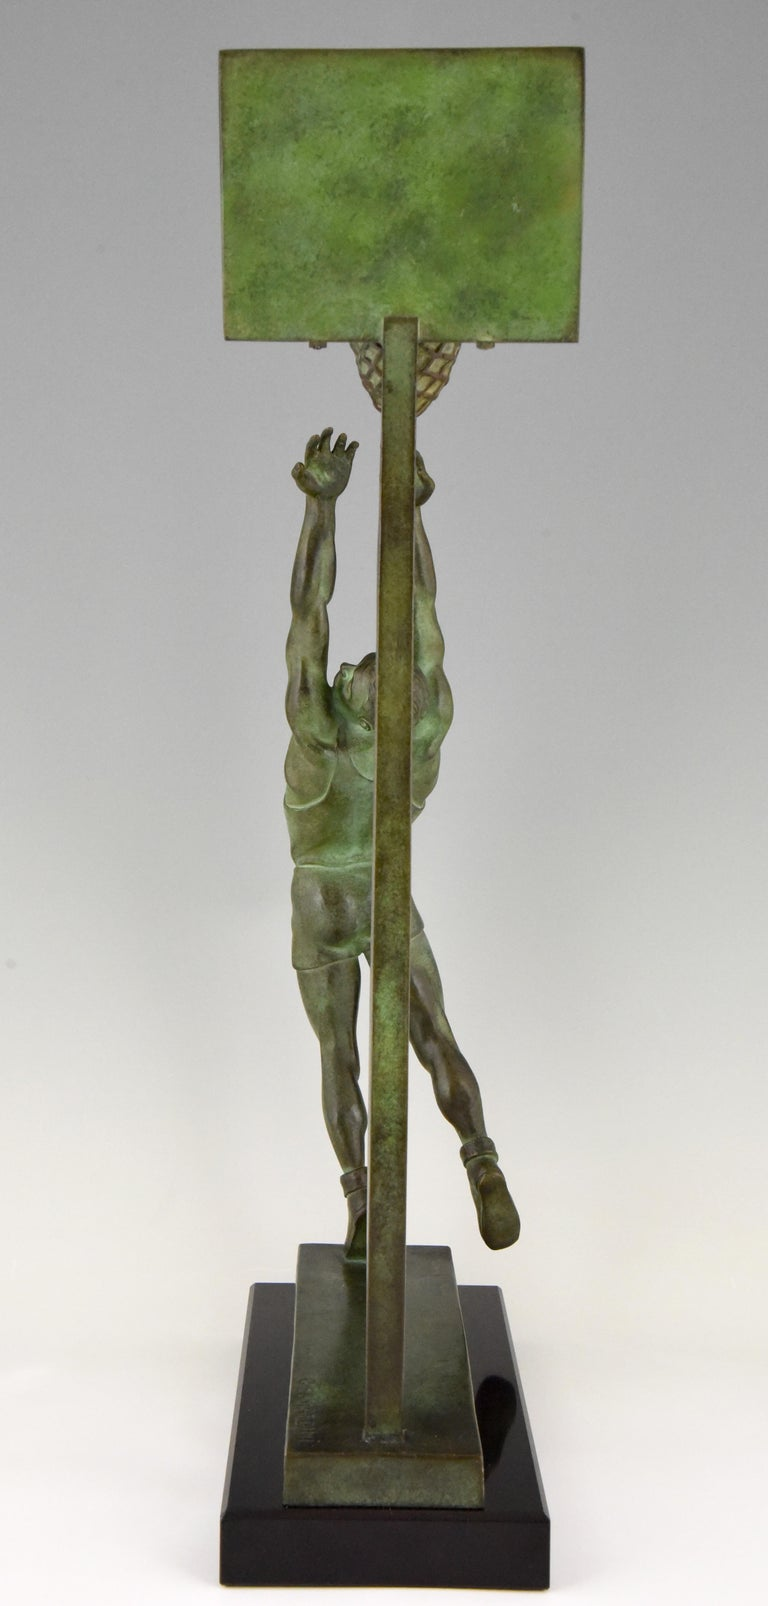 Art Deco Bronze Sculpture Basketball Player Reverse Dunk G. E. Mardini, France For Sale 3